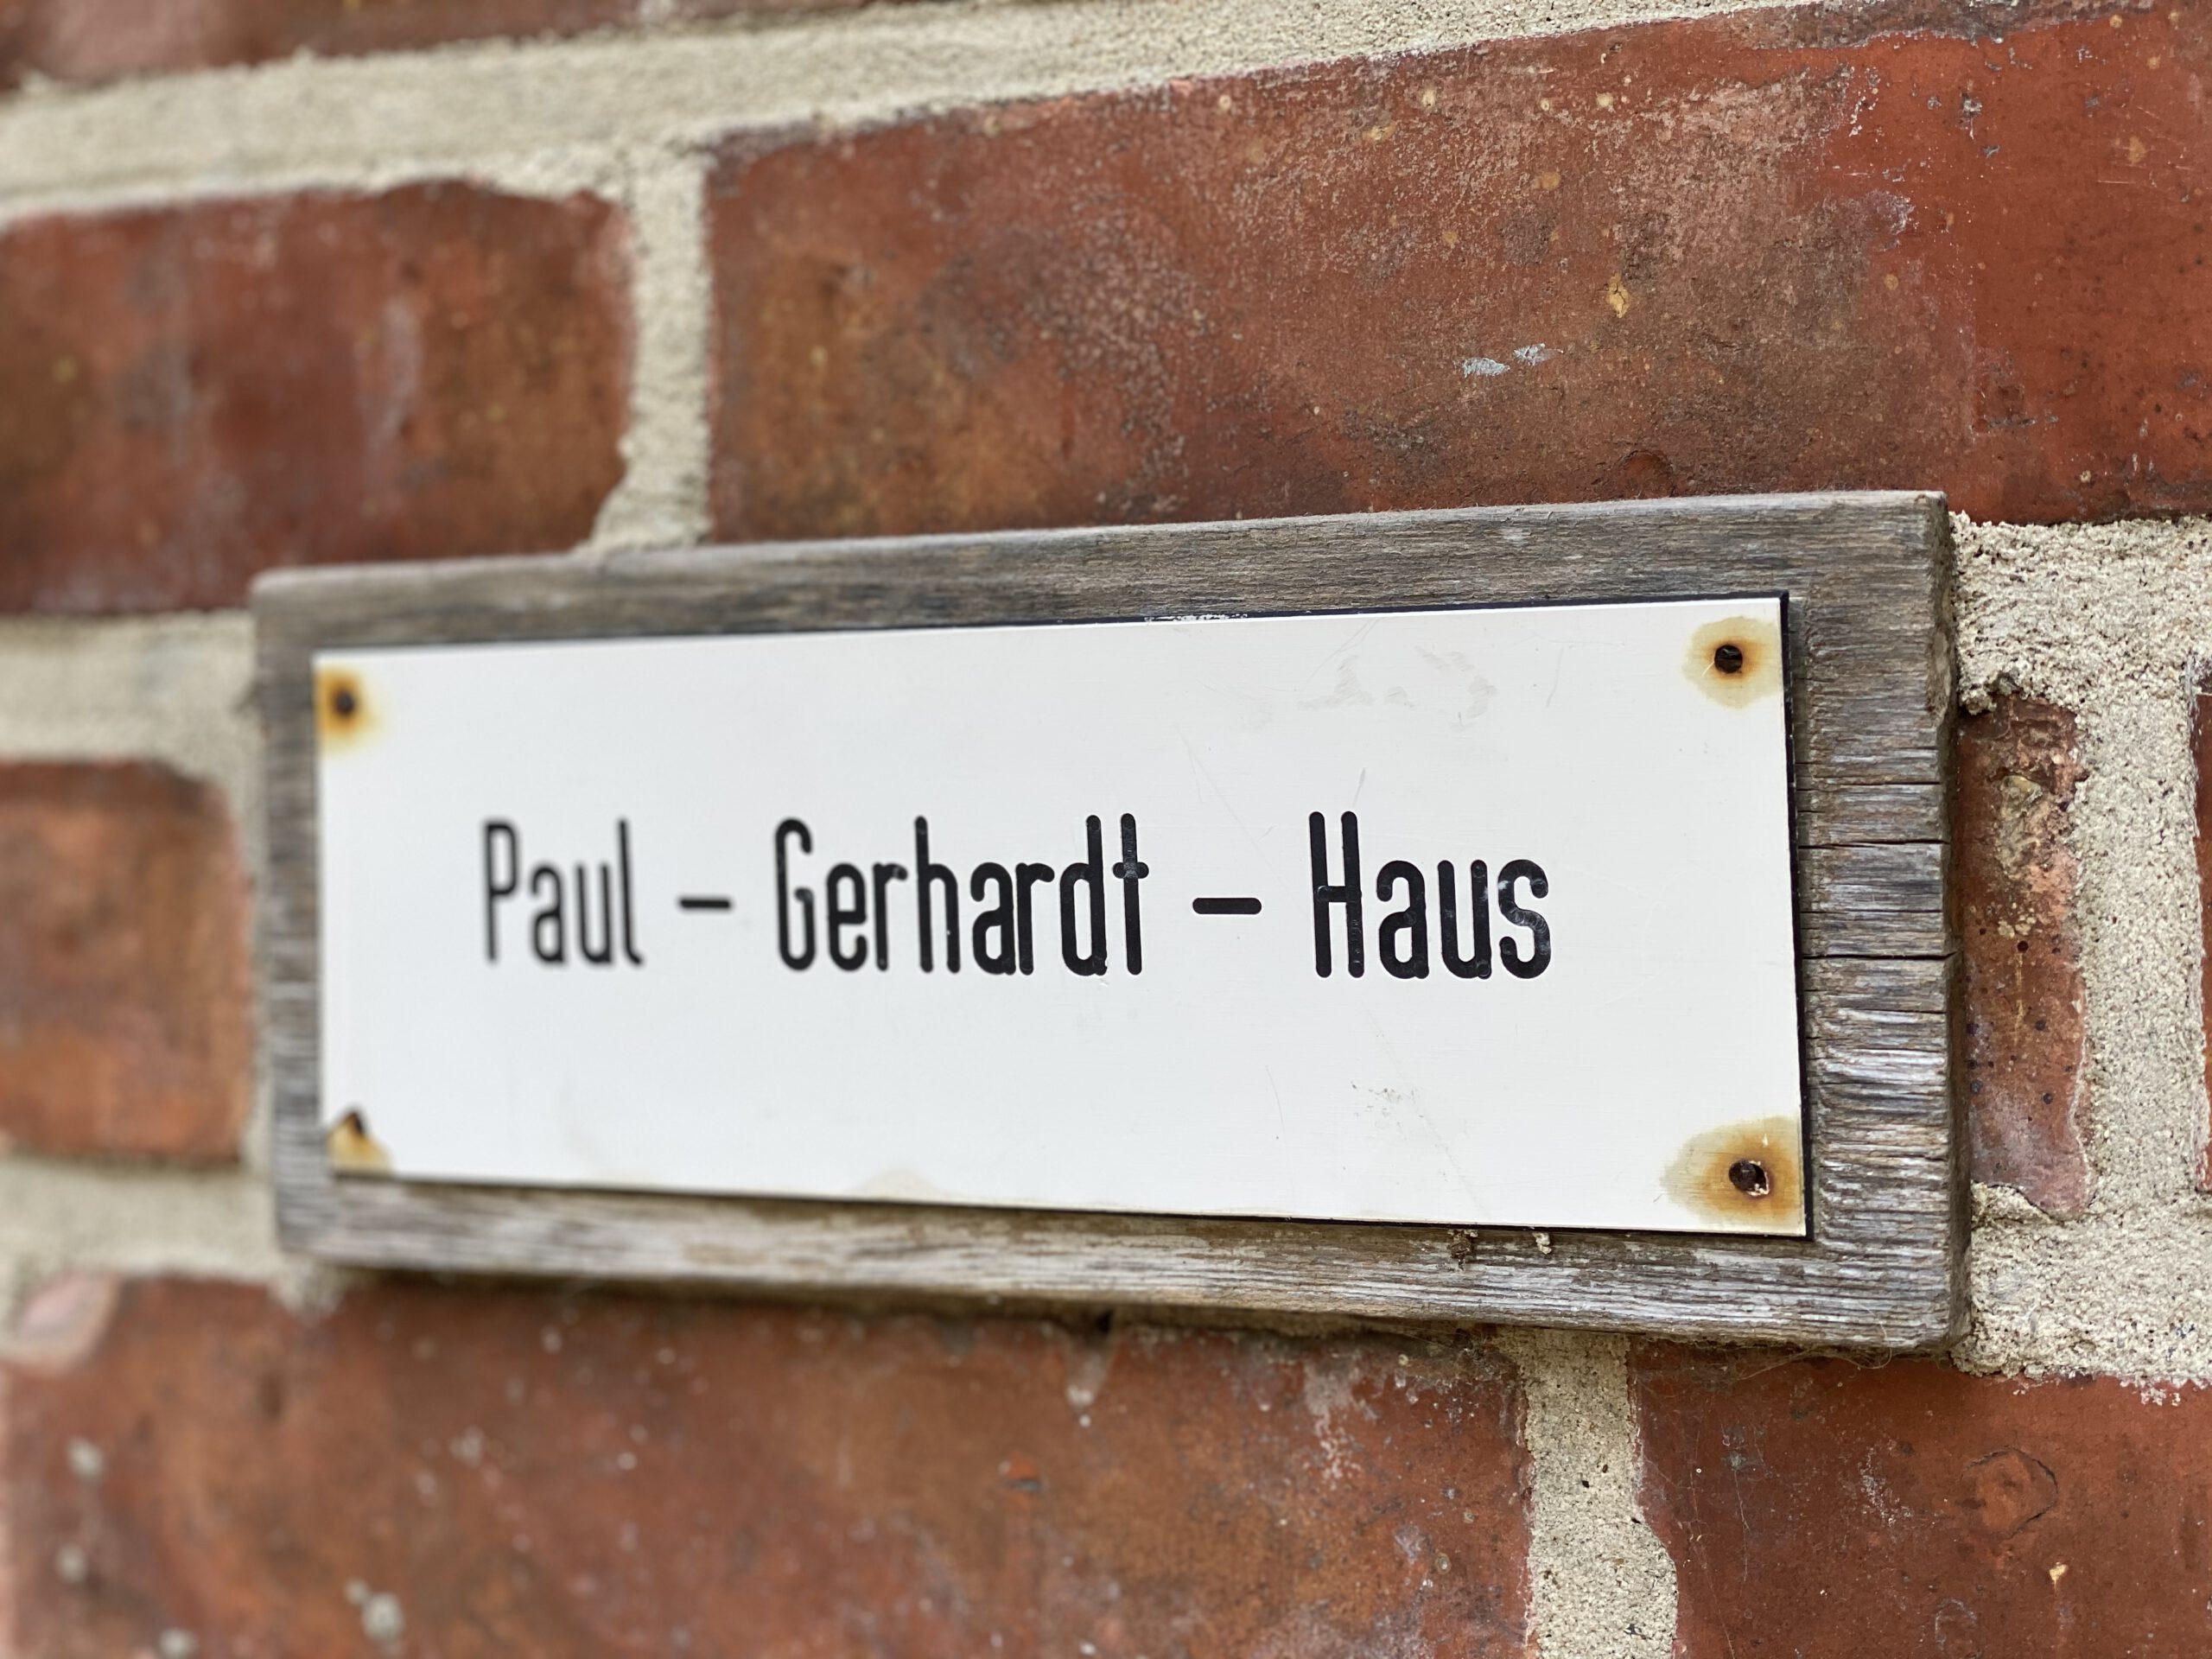 Paul-Gerhardt-Haus in Lobetal